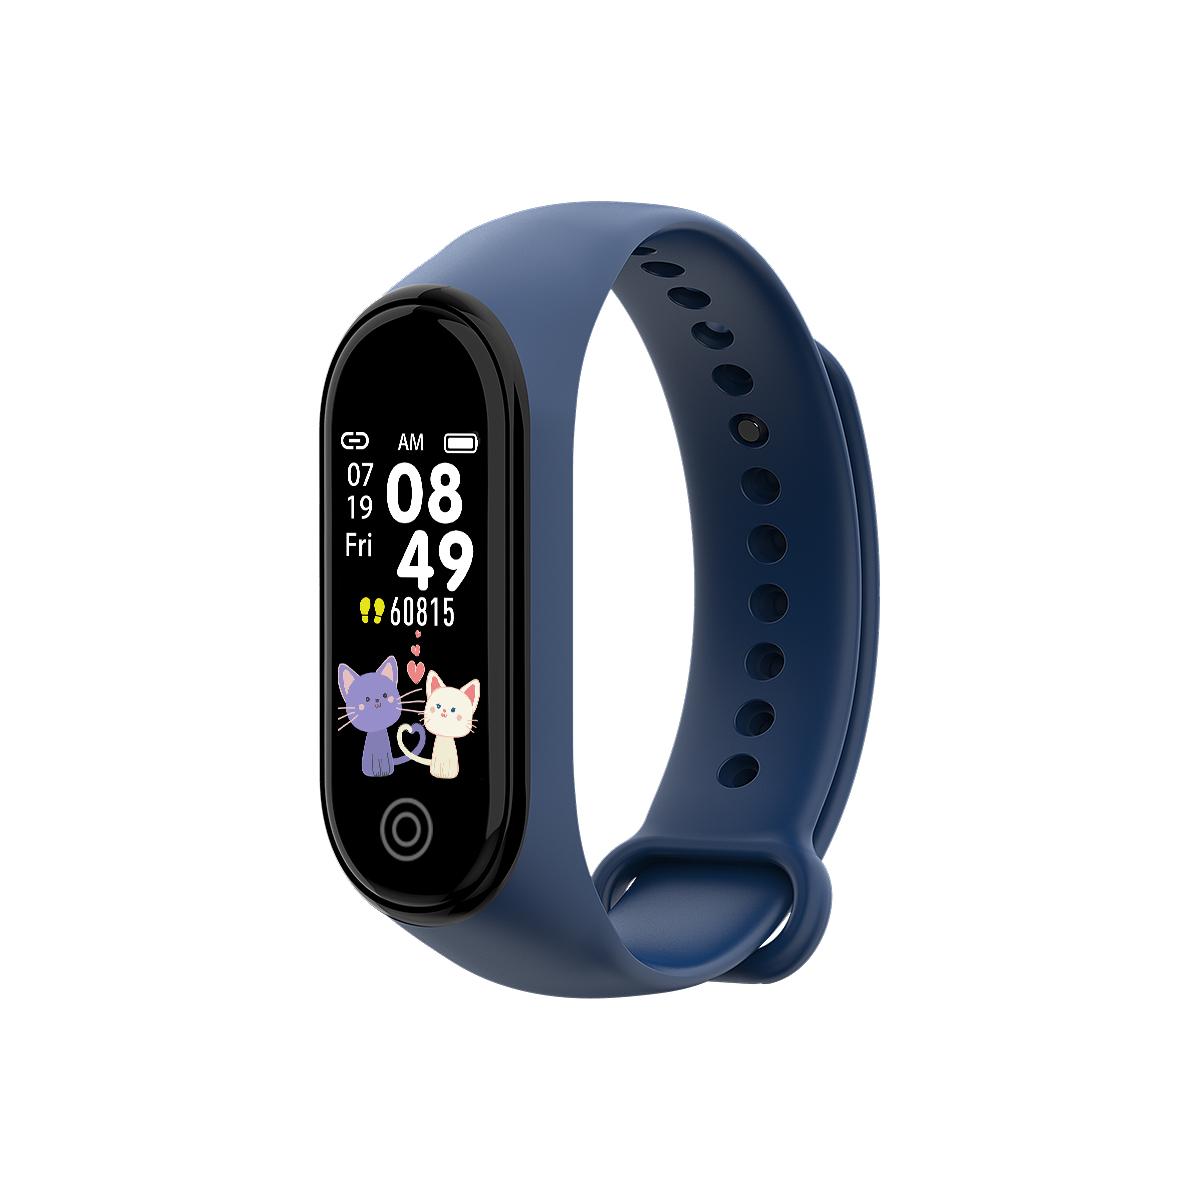 New RD05 Bracelet Smart Watch Fitness Tracking Sports Bracelet Heart Rate Blood Pressure Smart Bracelet Health Monitor blue